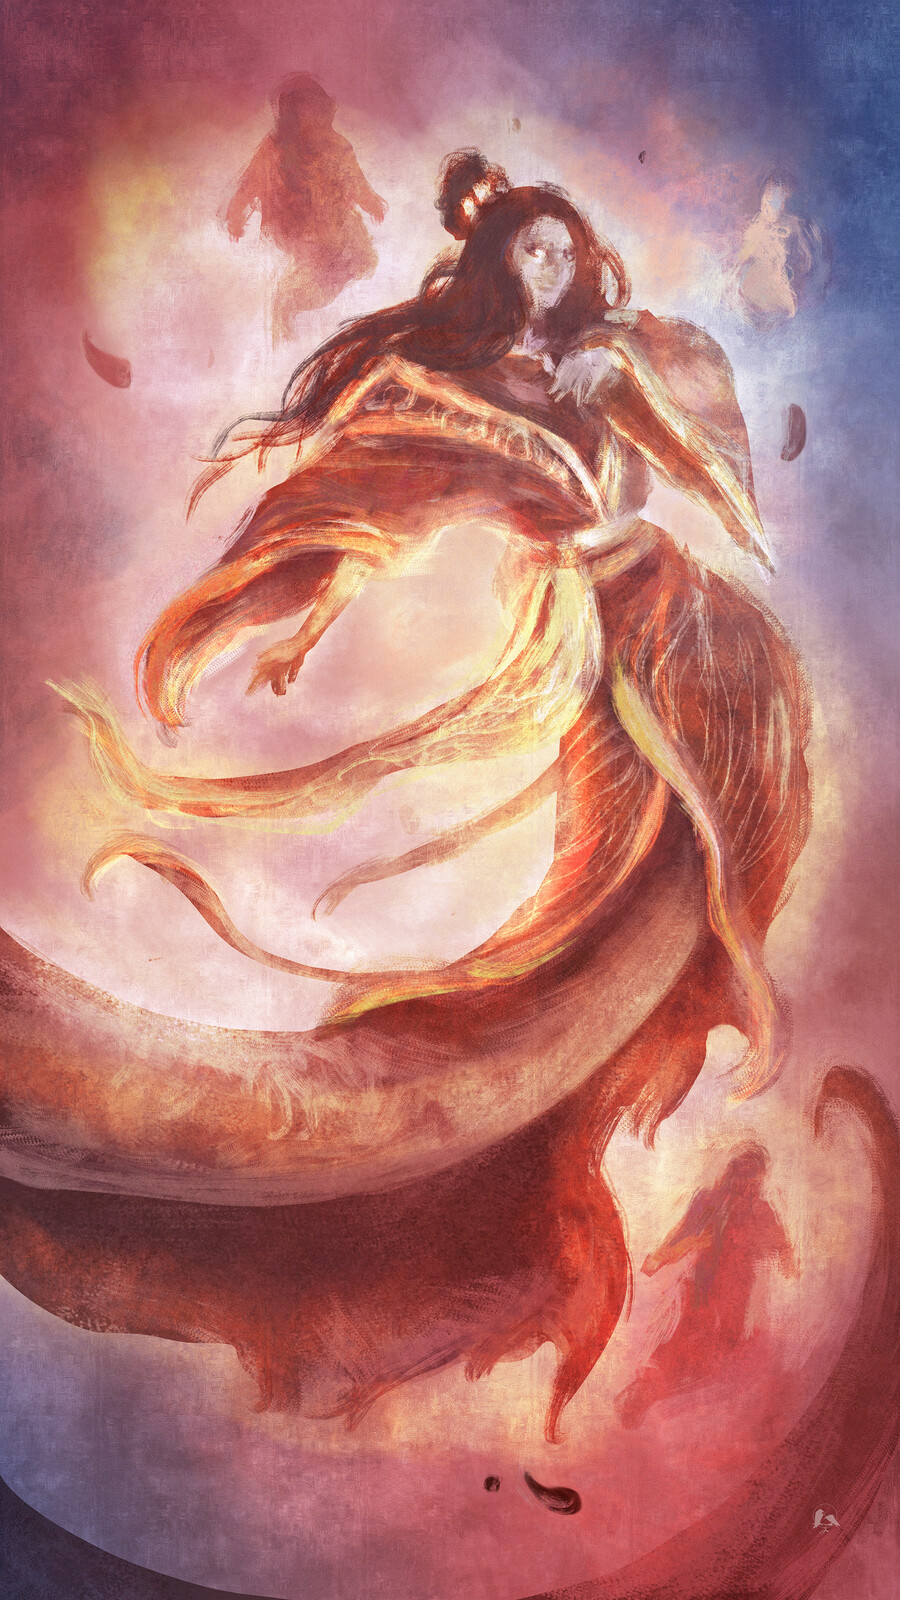 NÜWA- THE GODDESS OF CREATION